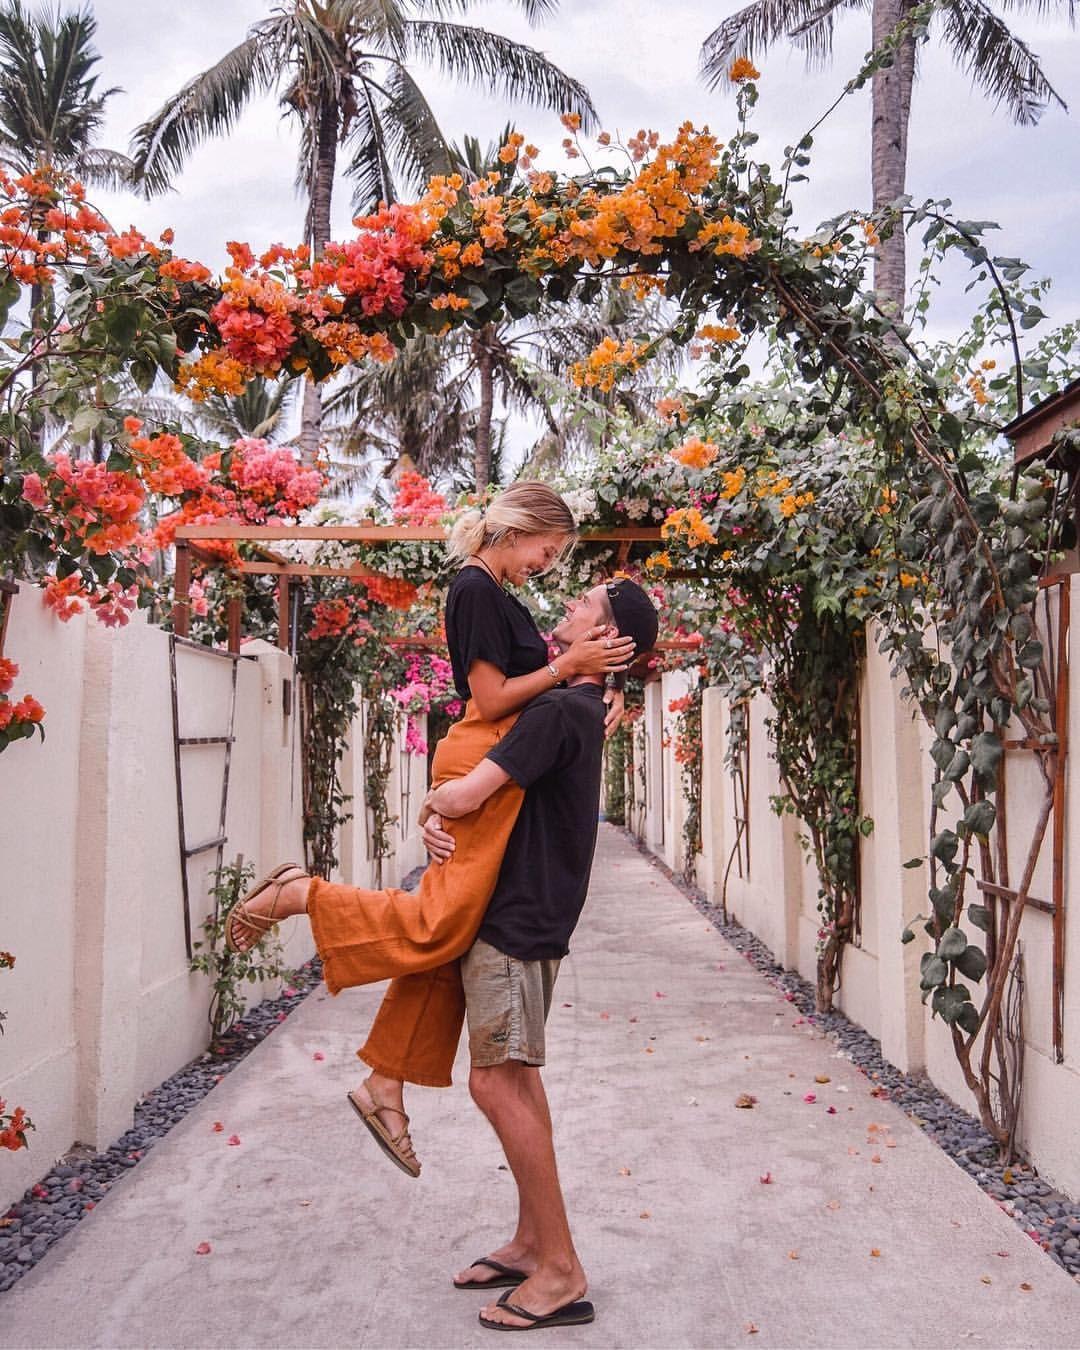 Gili Trawangan Gili T Lombok Indonesia - Charlie & Lauren UK Travel Couple - Wanderers & Warriors - Pretty Flowers